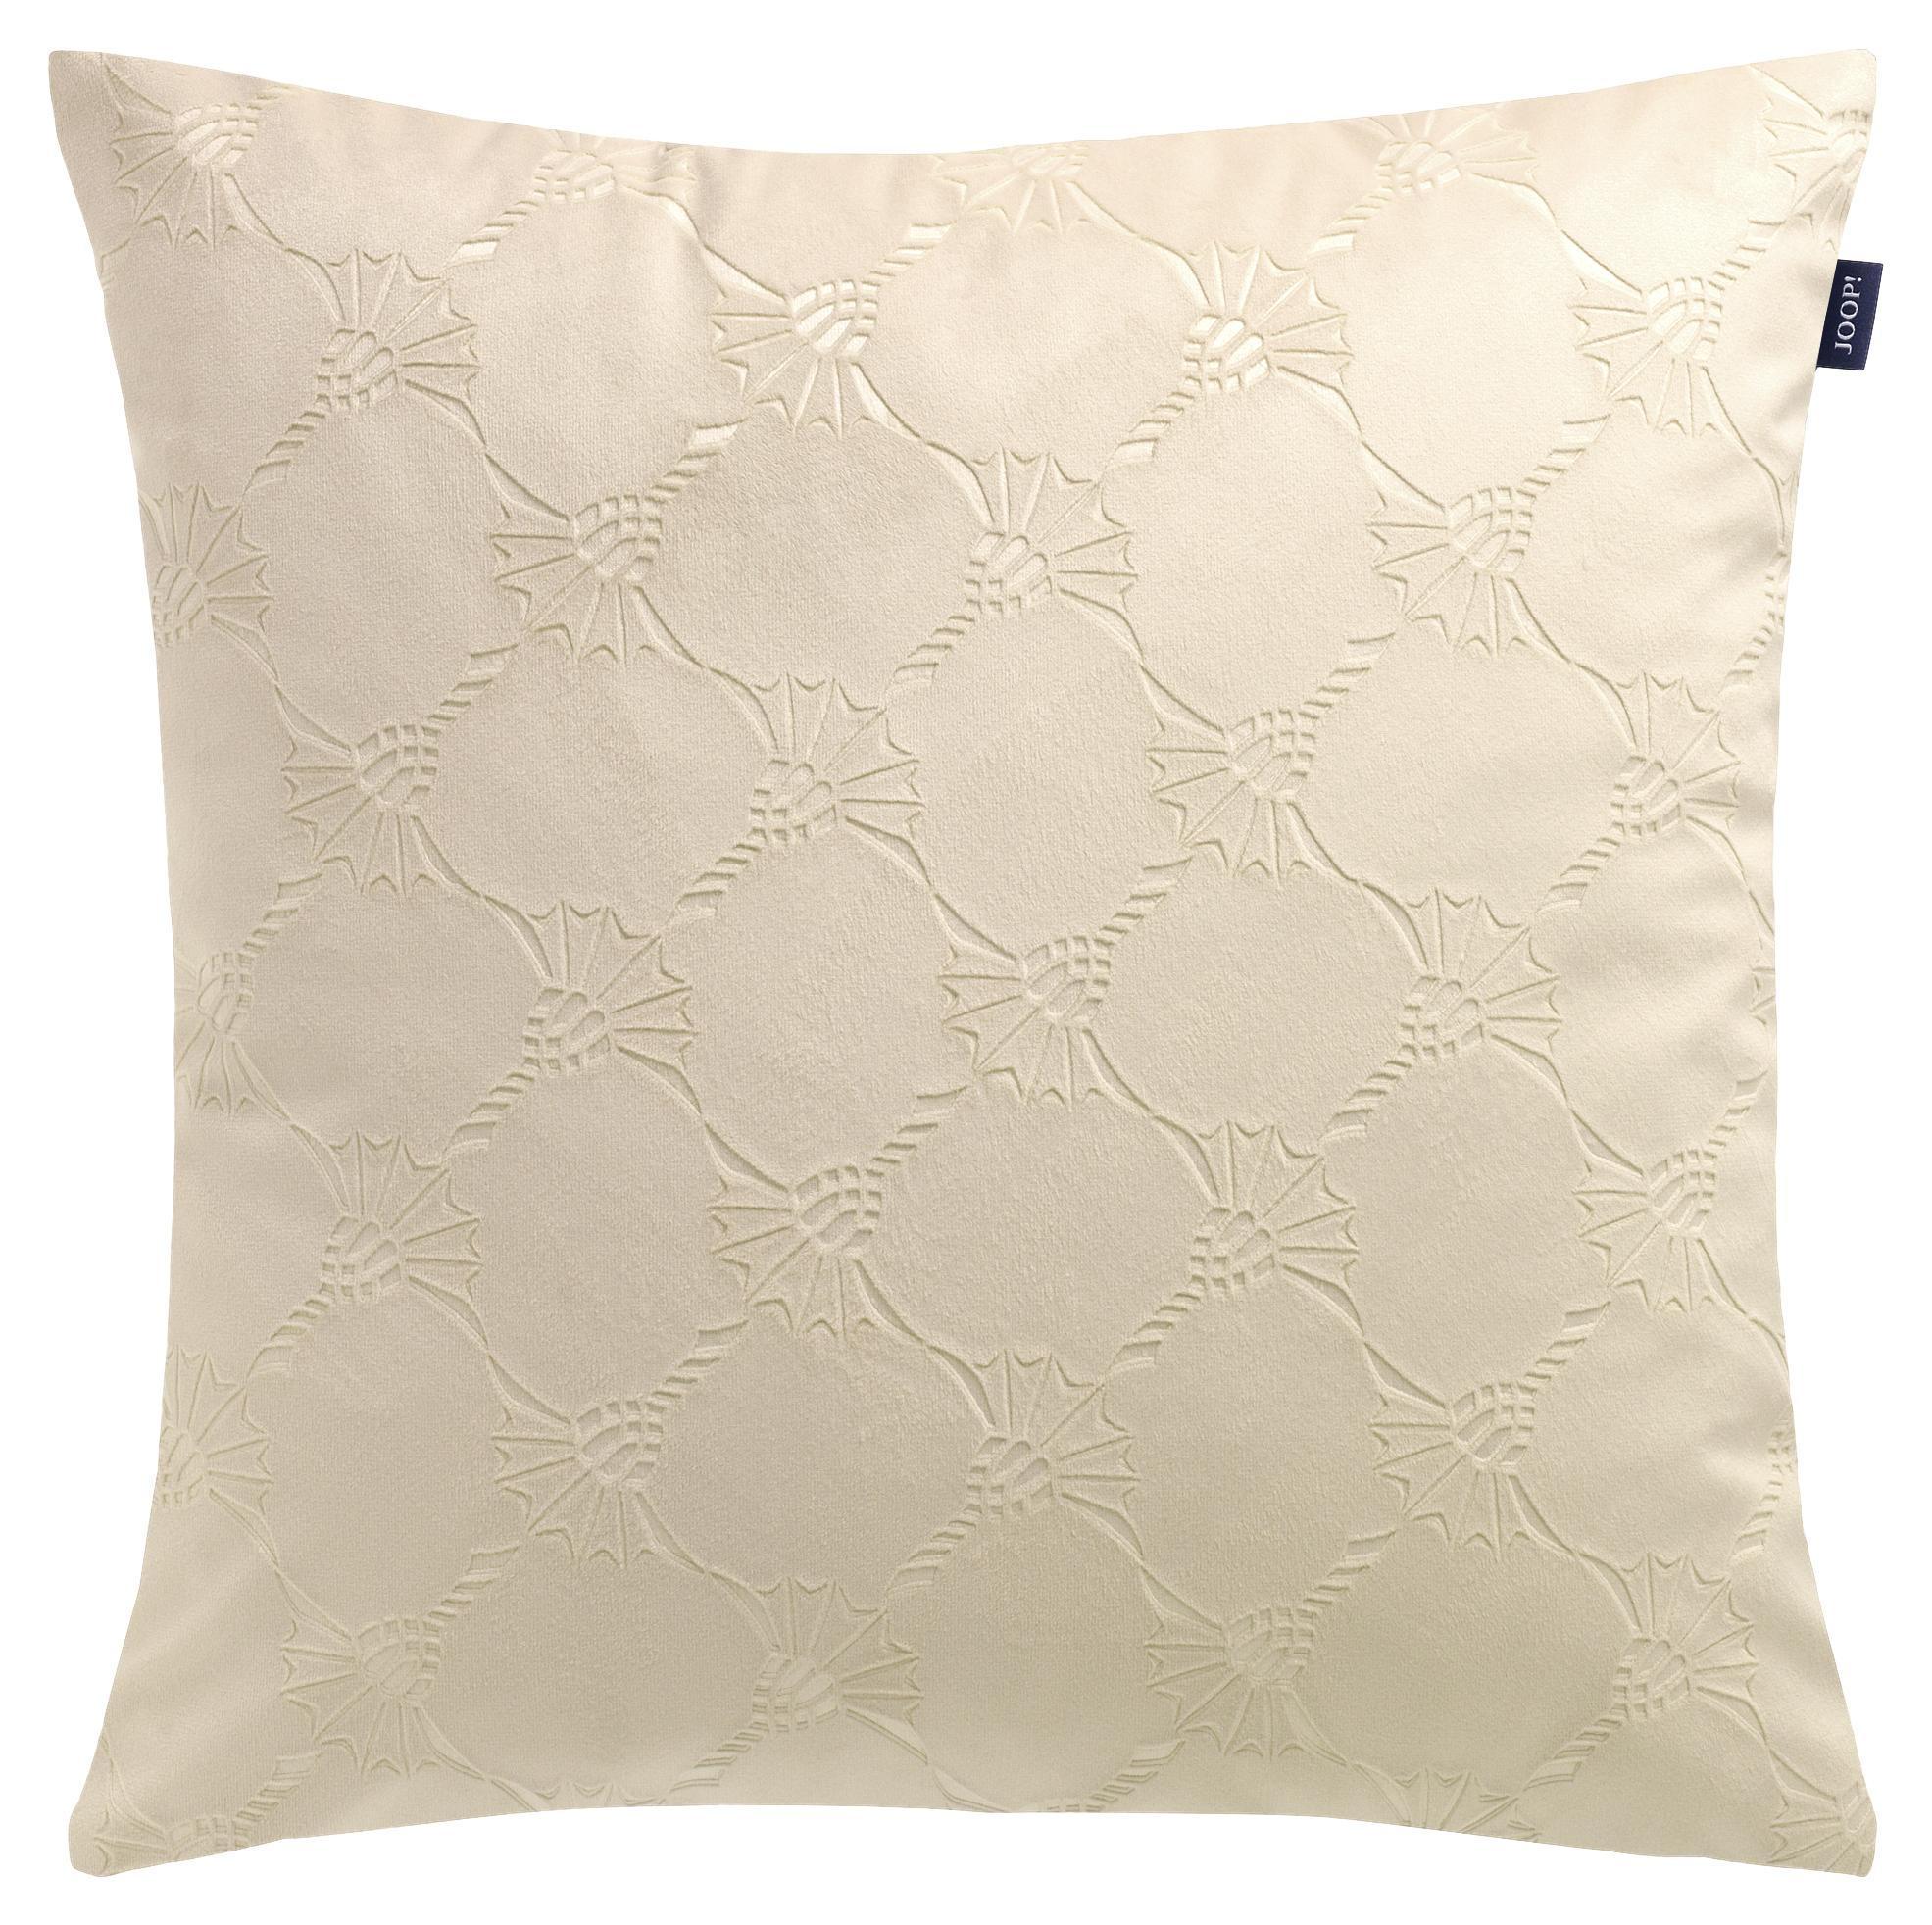 Sprügel Kissen Kissenhülle Raute elegant  beige taupe gold 40x40cm   60x60